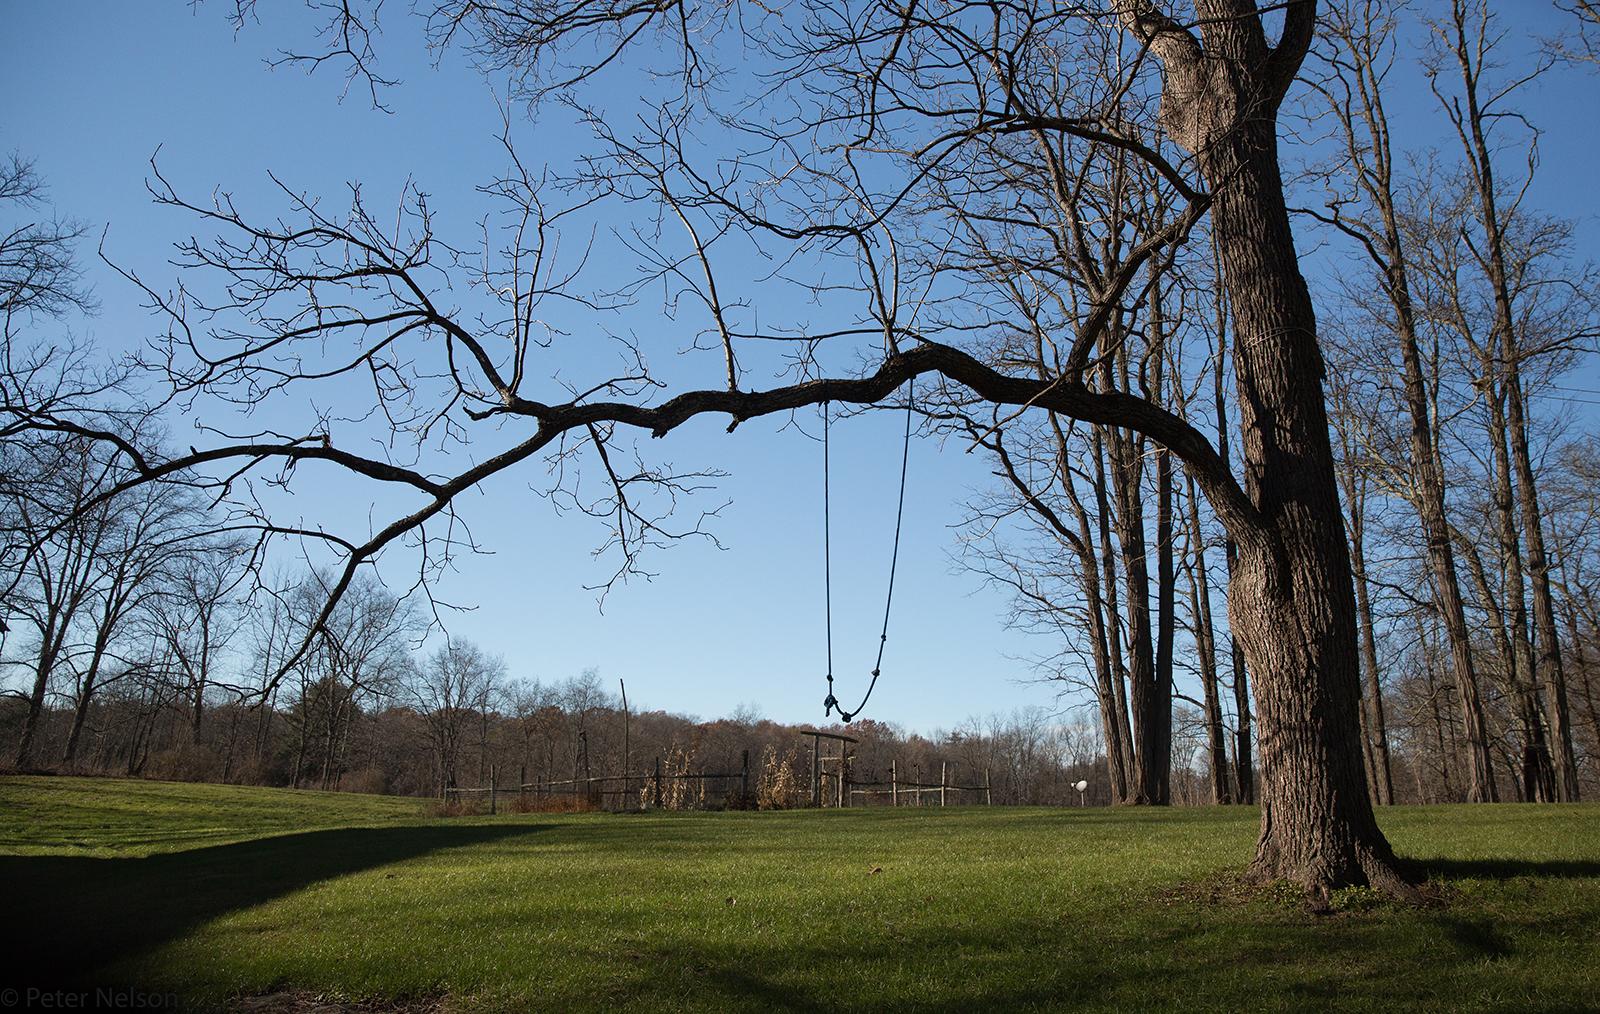 A black walnut tree and garden view